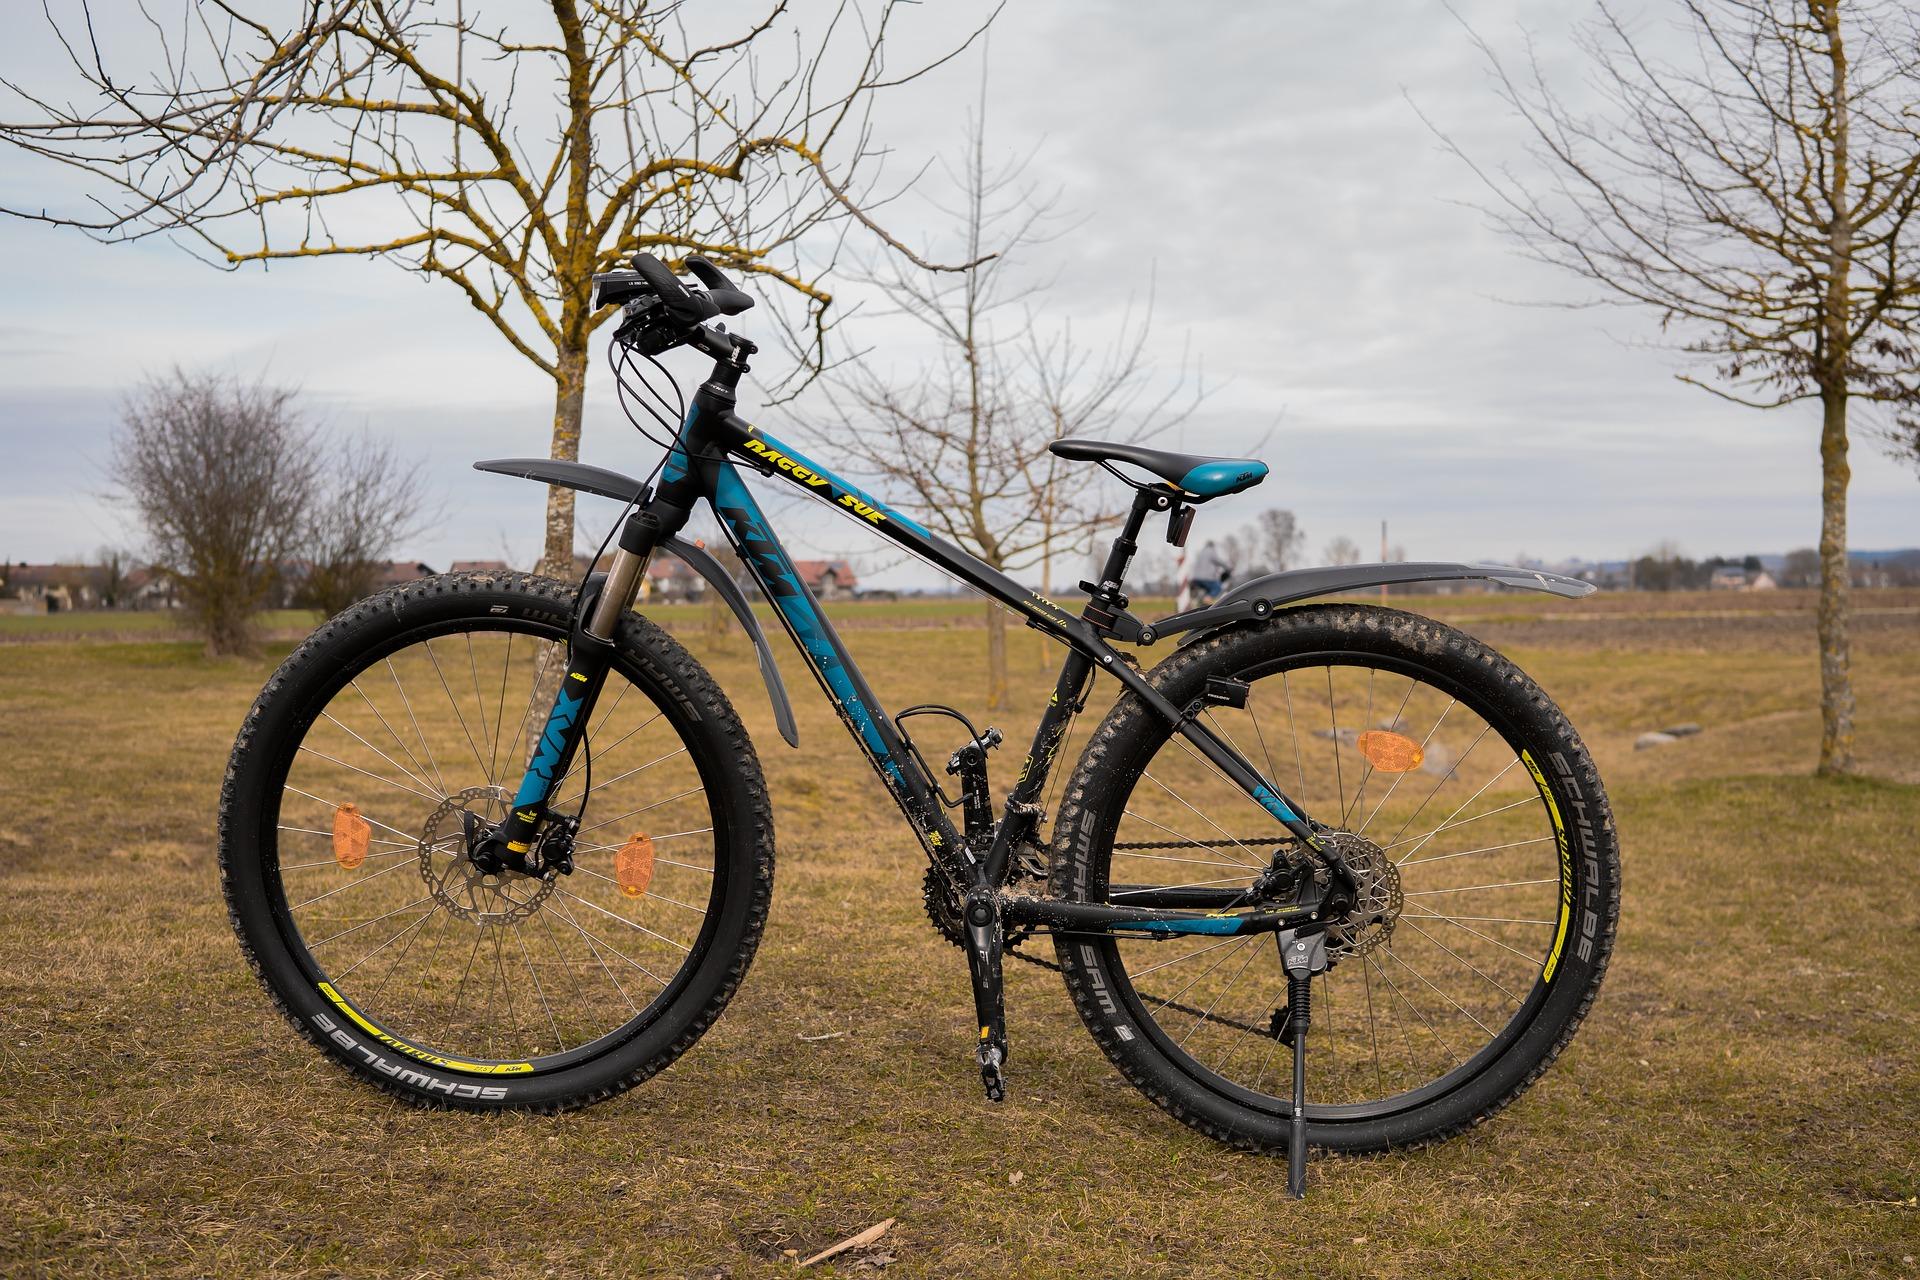 Road Bike vs Mountain Bike: Choosing The Right Ride